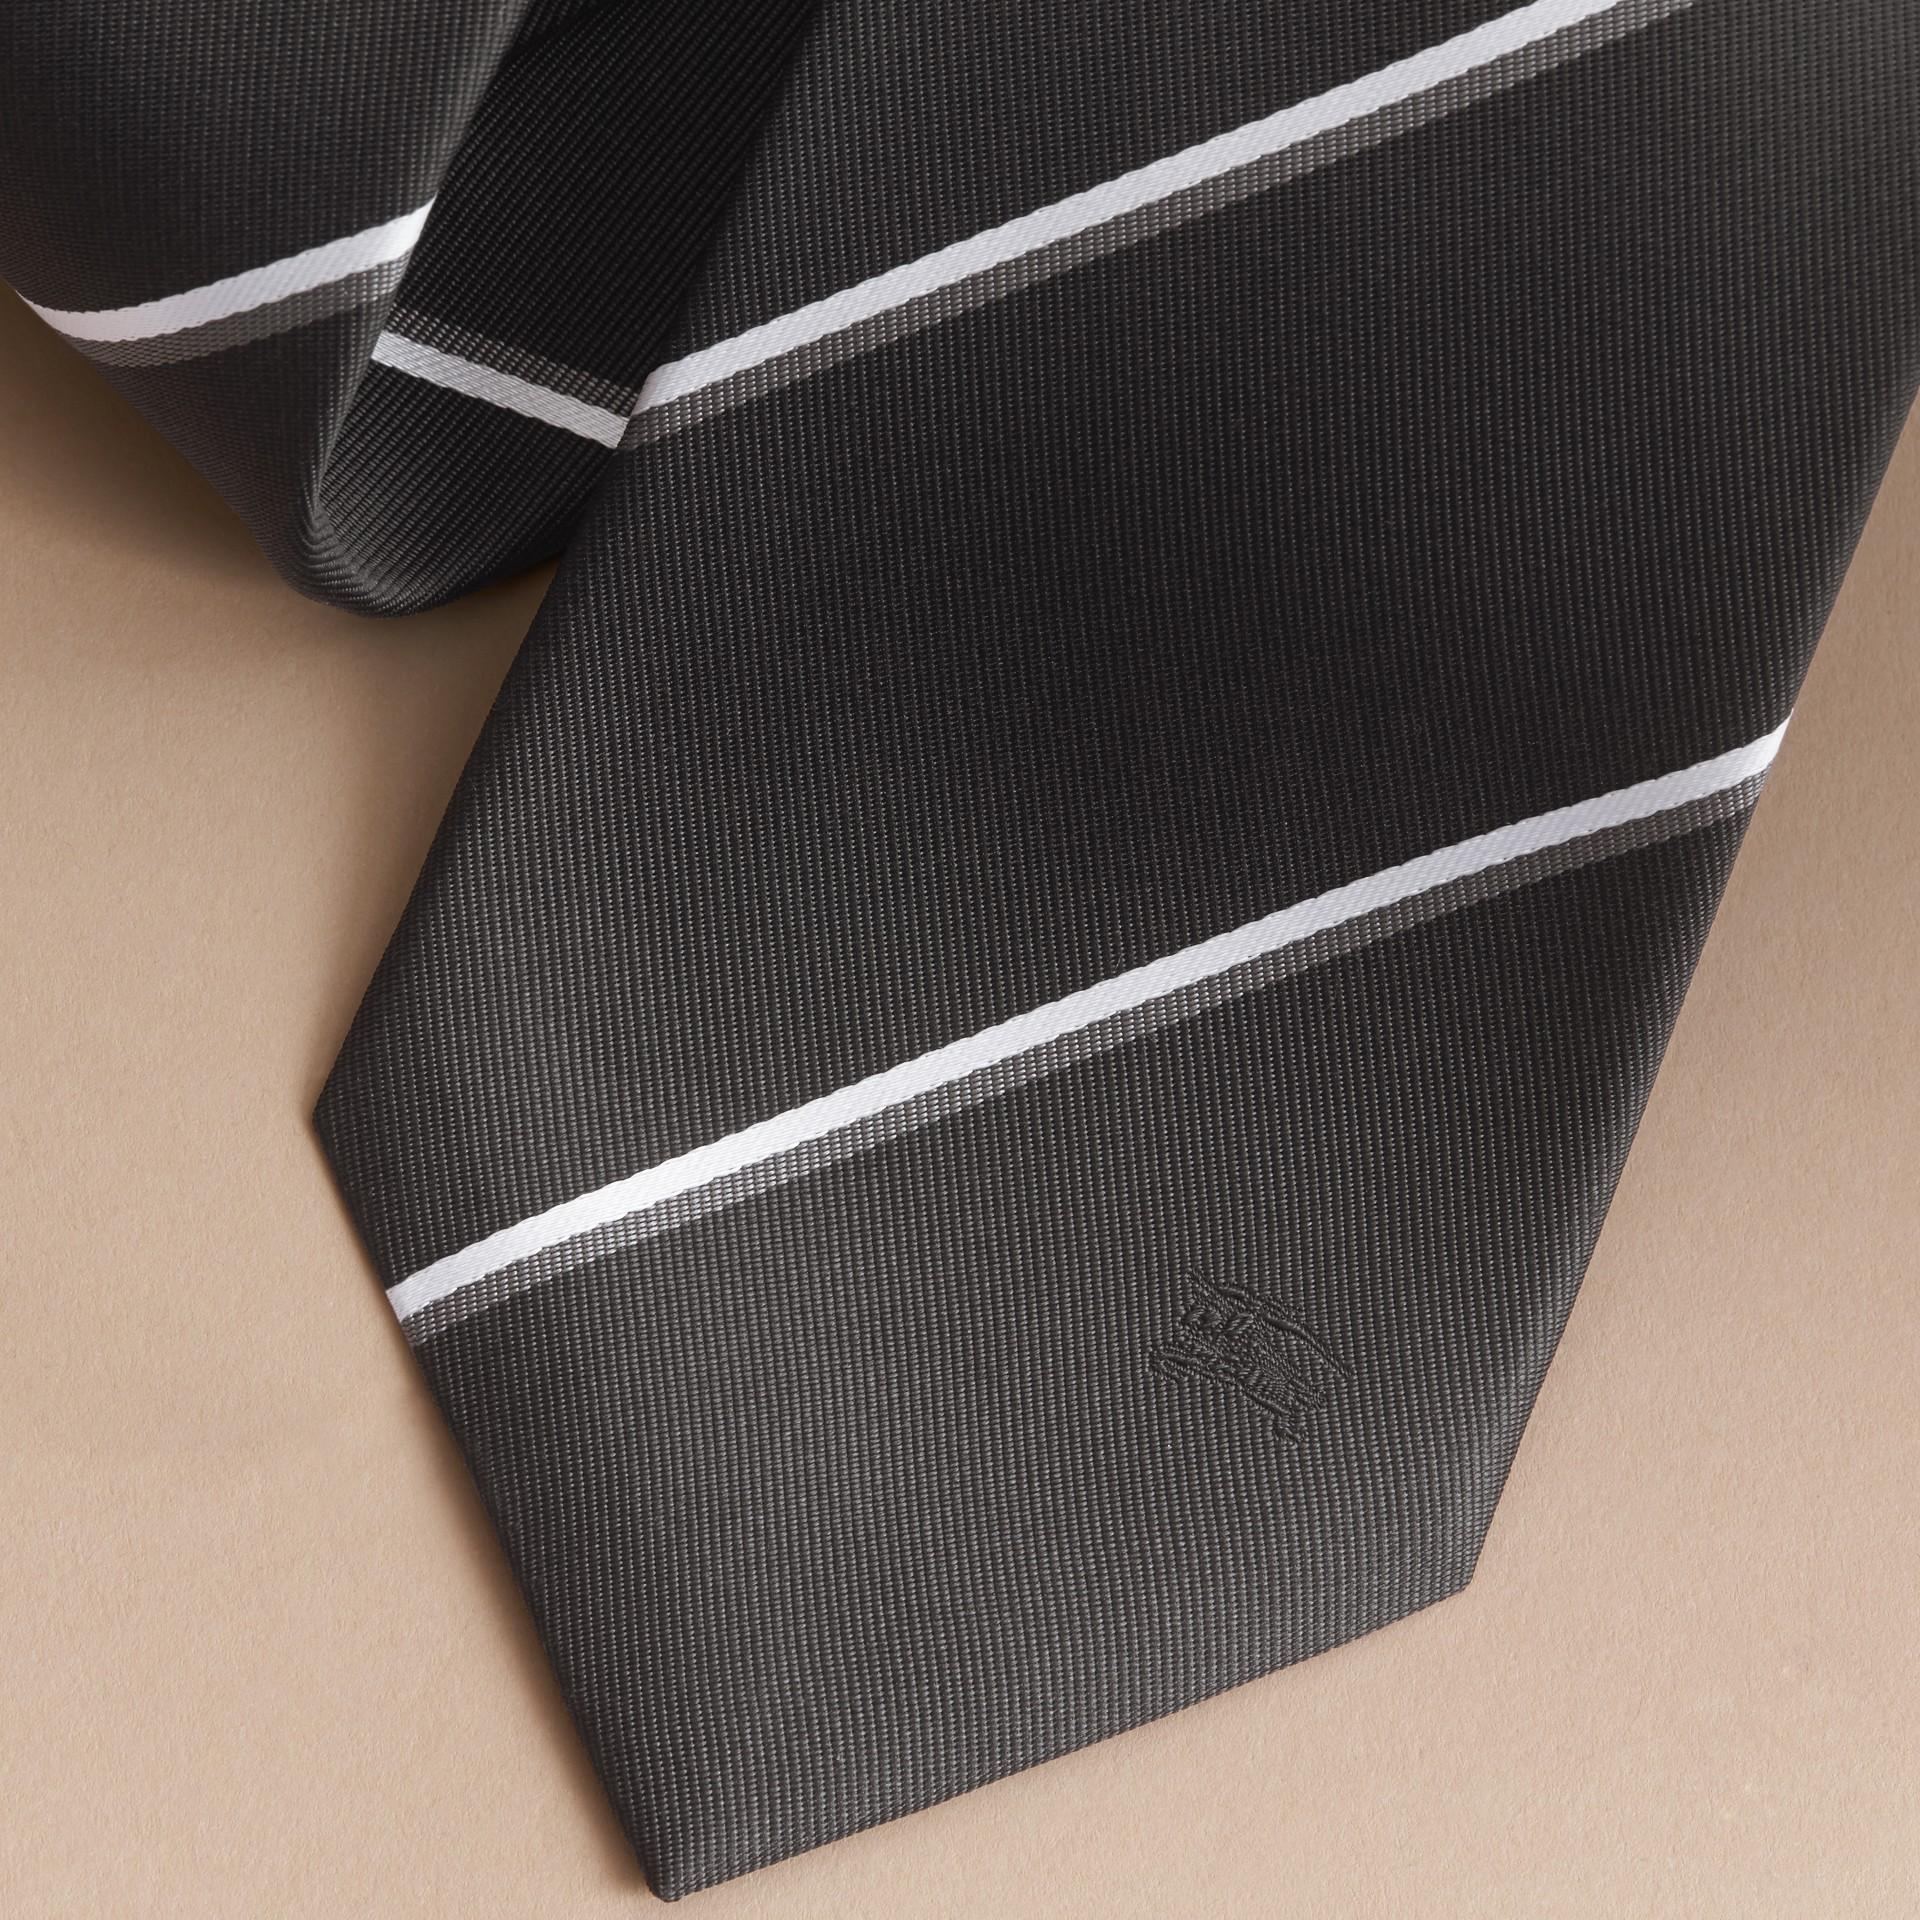 Classic Cut Striped Silk Jacquard Tie in Black - gallery image 2